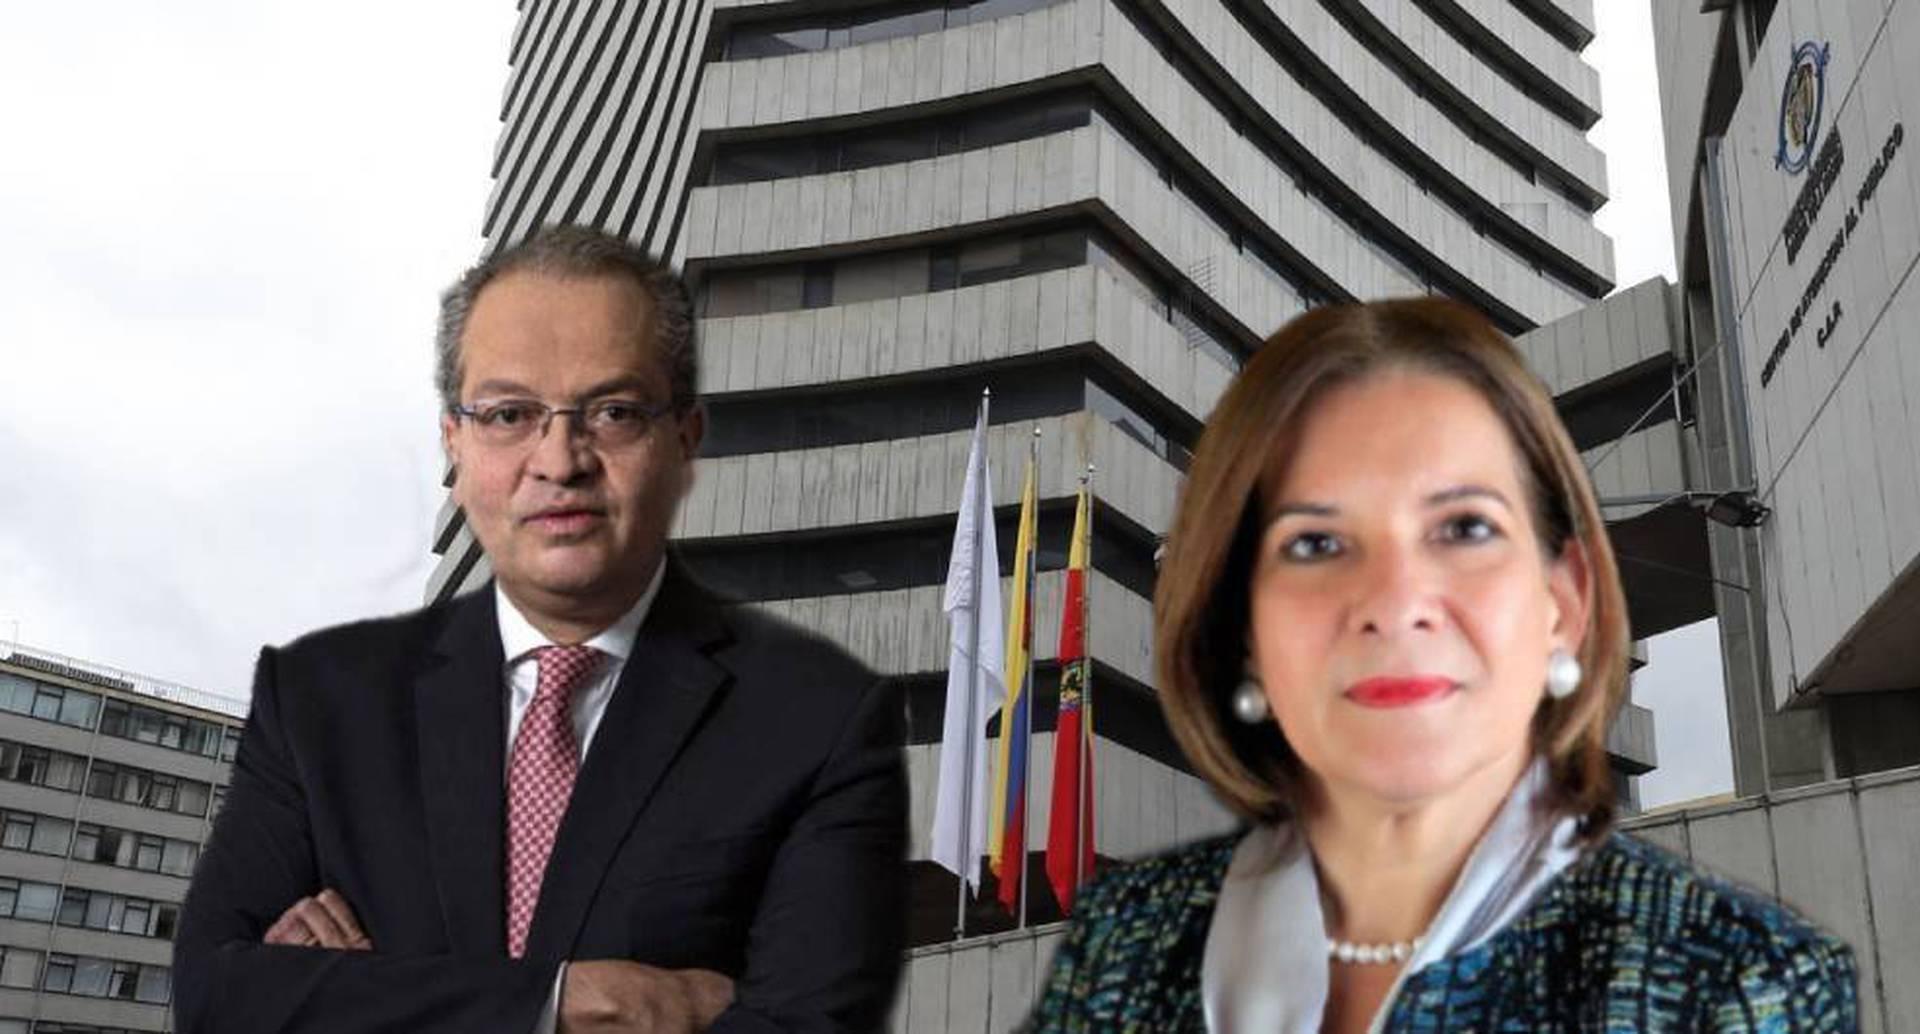 Cabello reemplazará a Carrillo en el cargo.